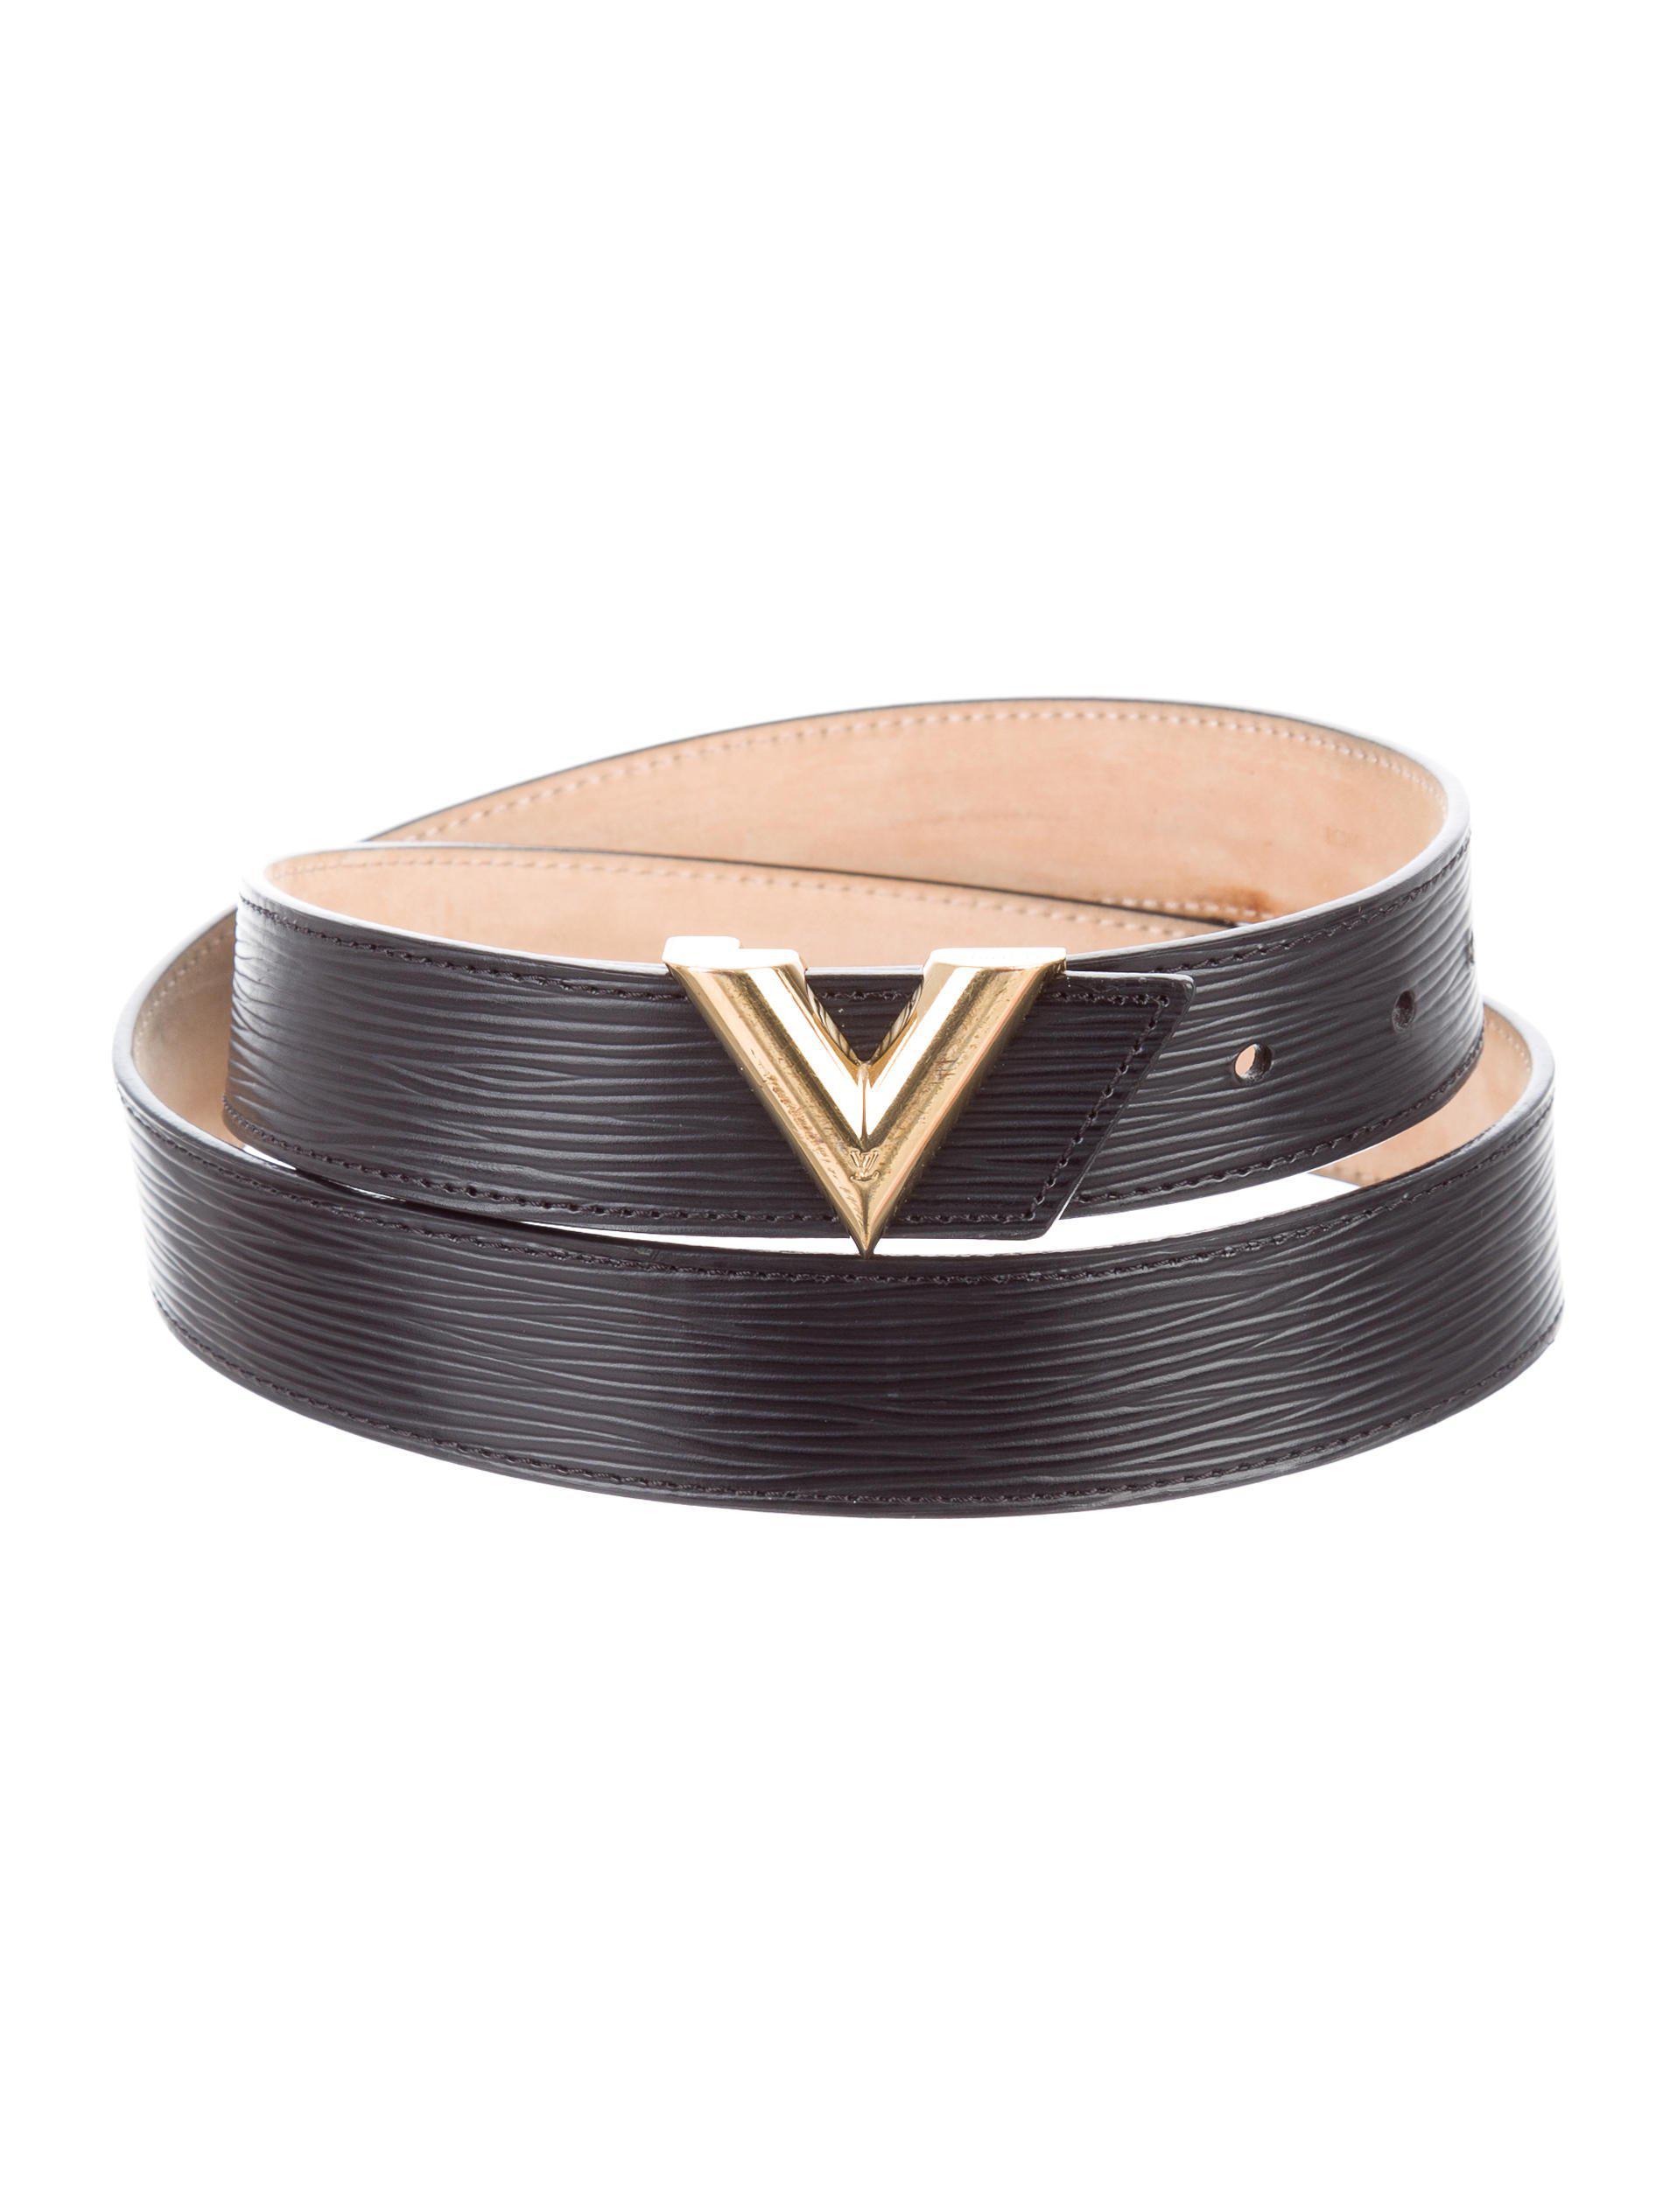 Small Leather Goods - Belts Kristina Ti bydHA